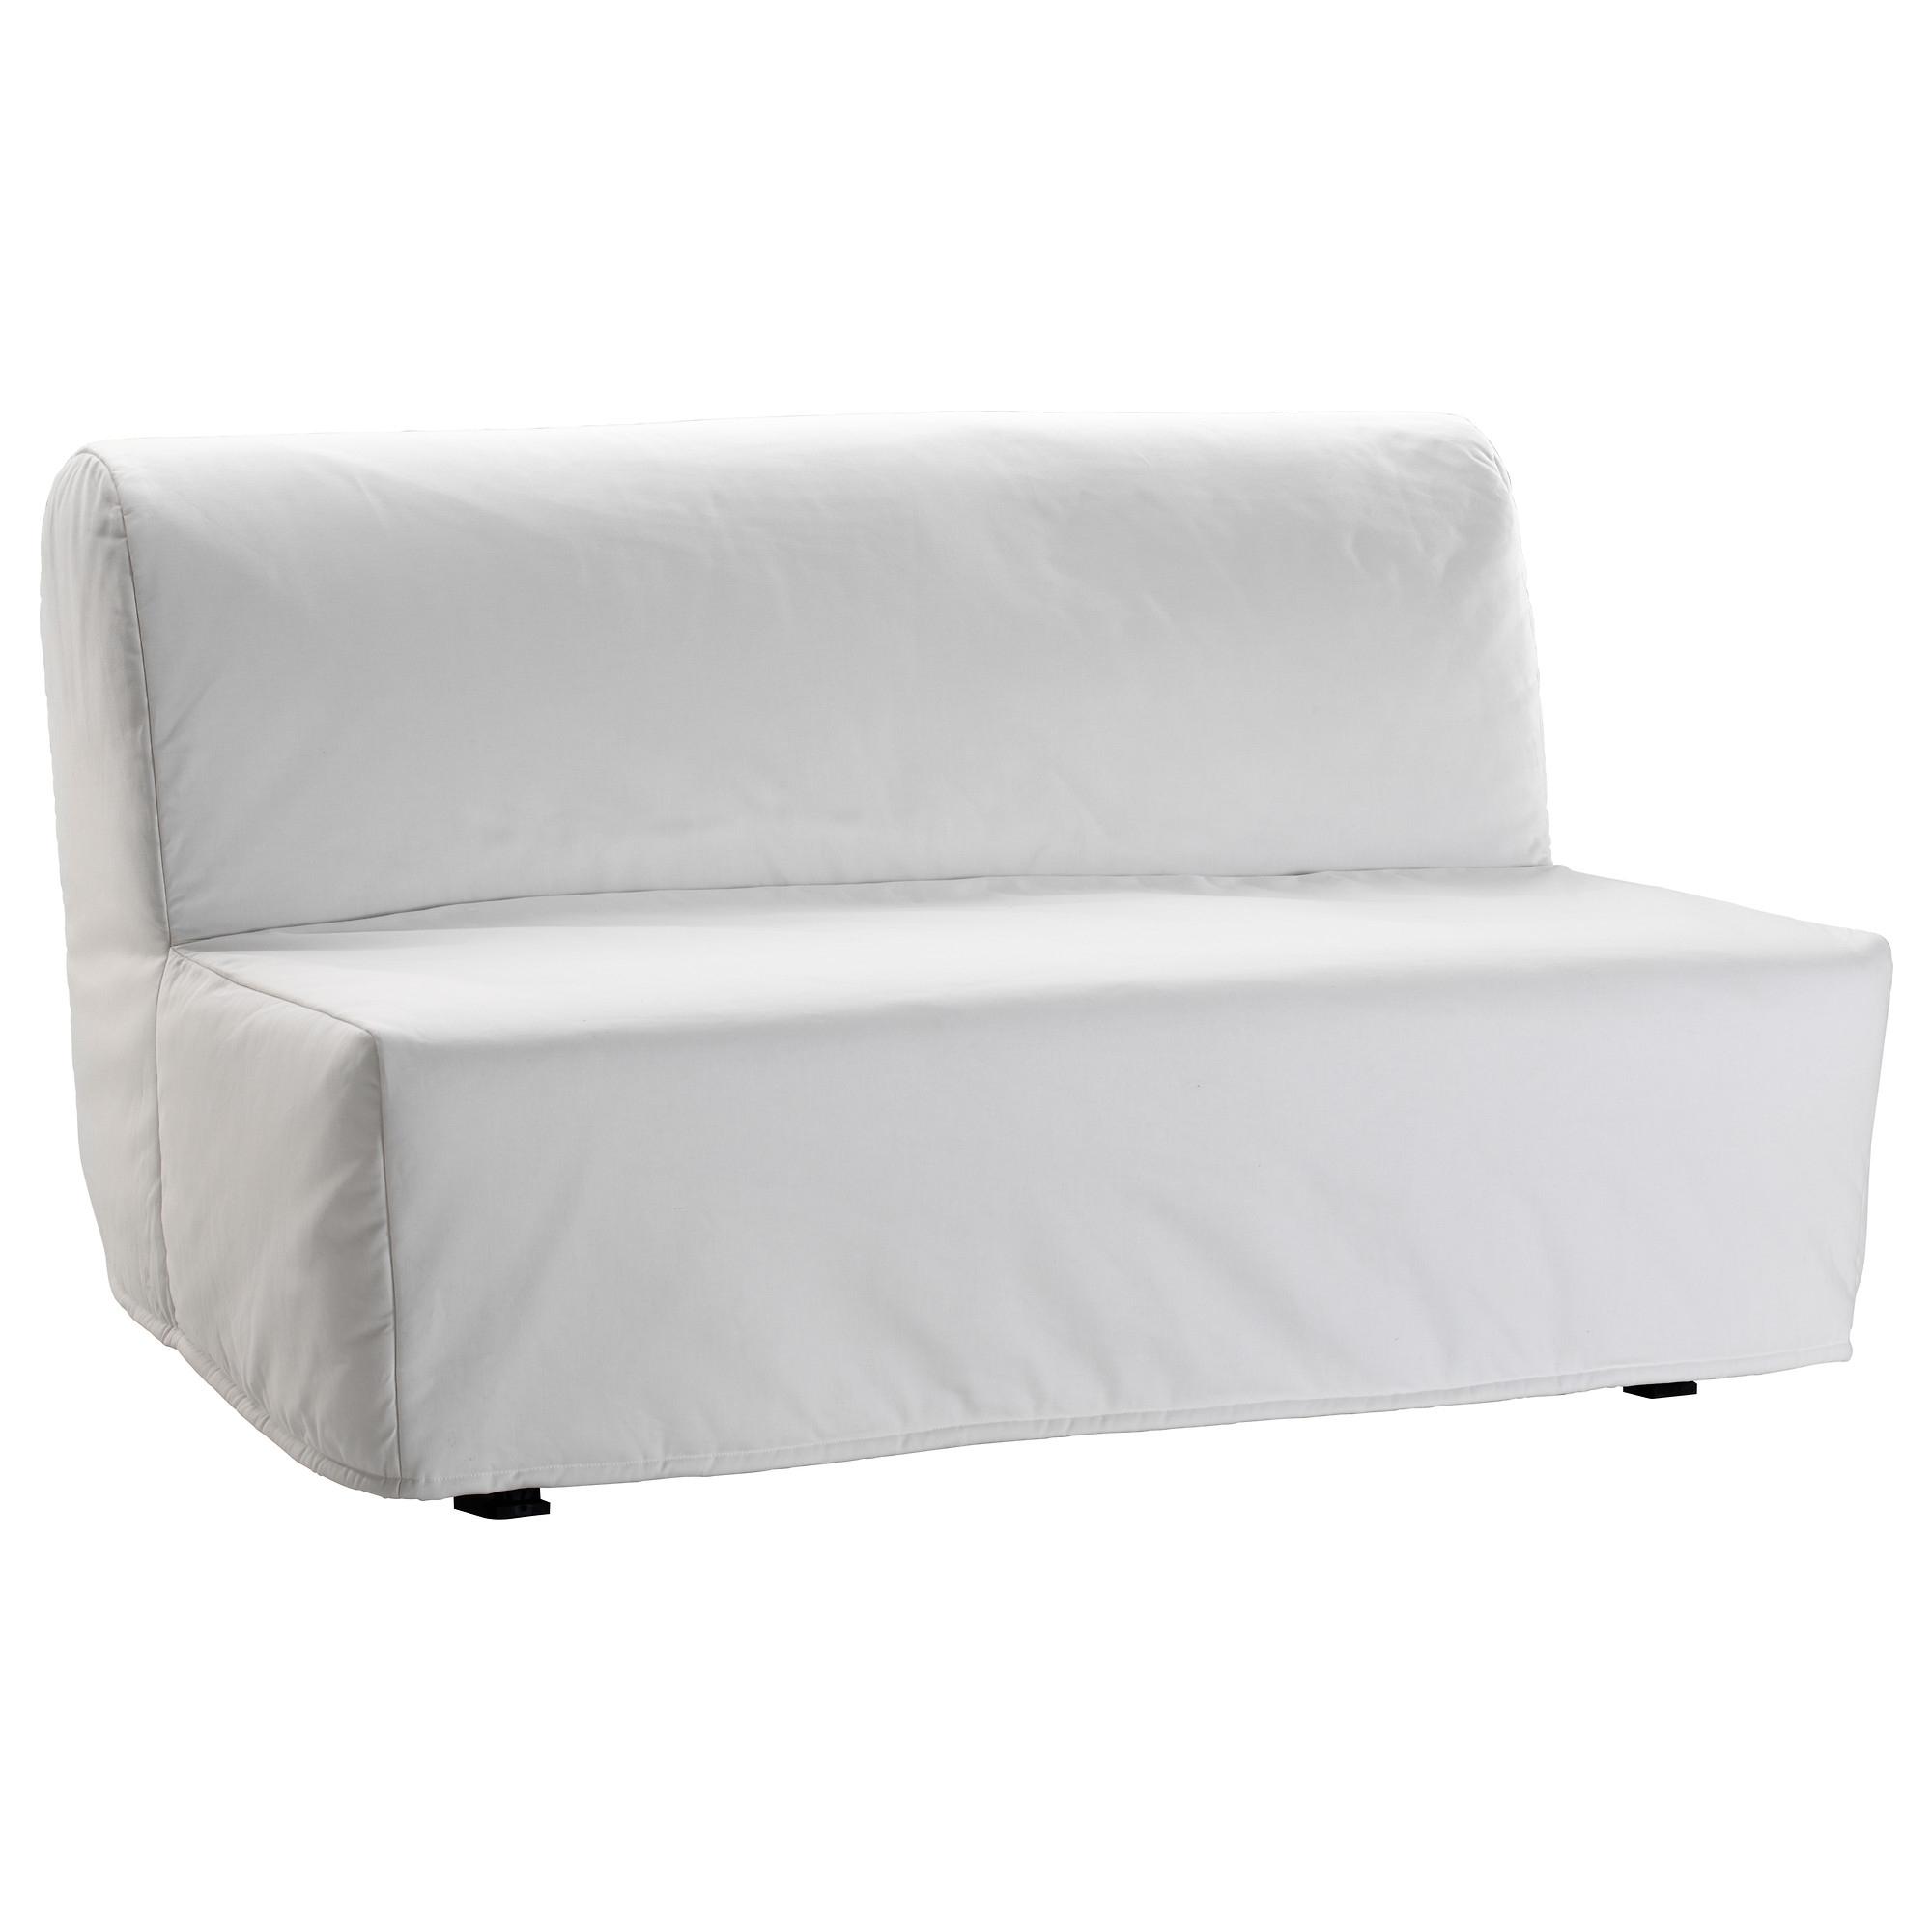 Lycksele Lövås Sleeper Sofa – Ransta White – Ikea Regarding Most Recently Released Ikea Loveseat Sleeper Sofas (View 15 of 20)